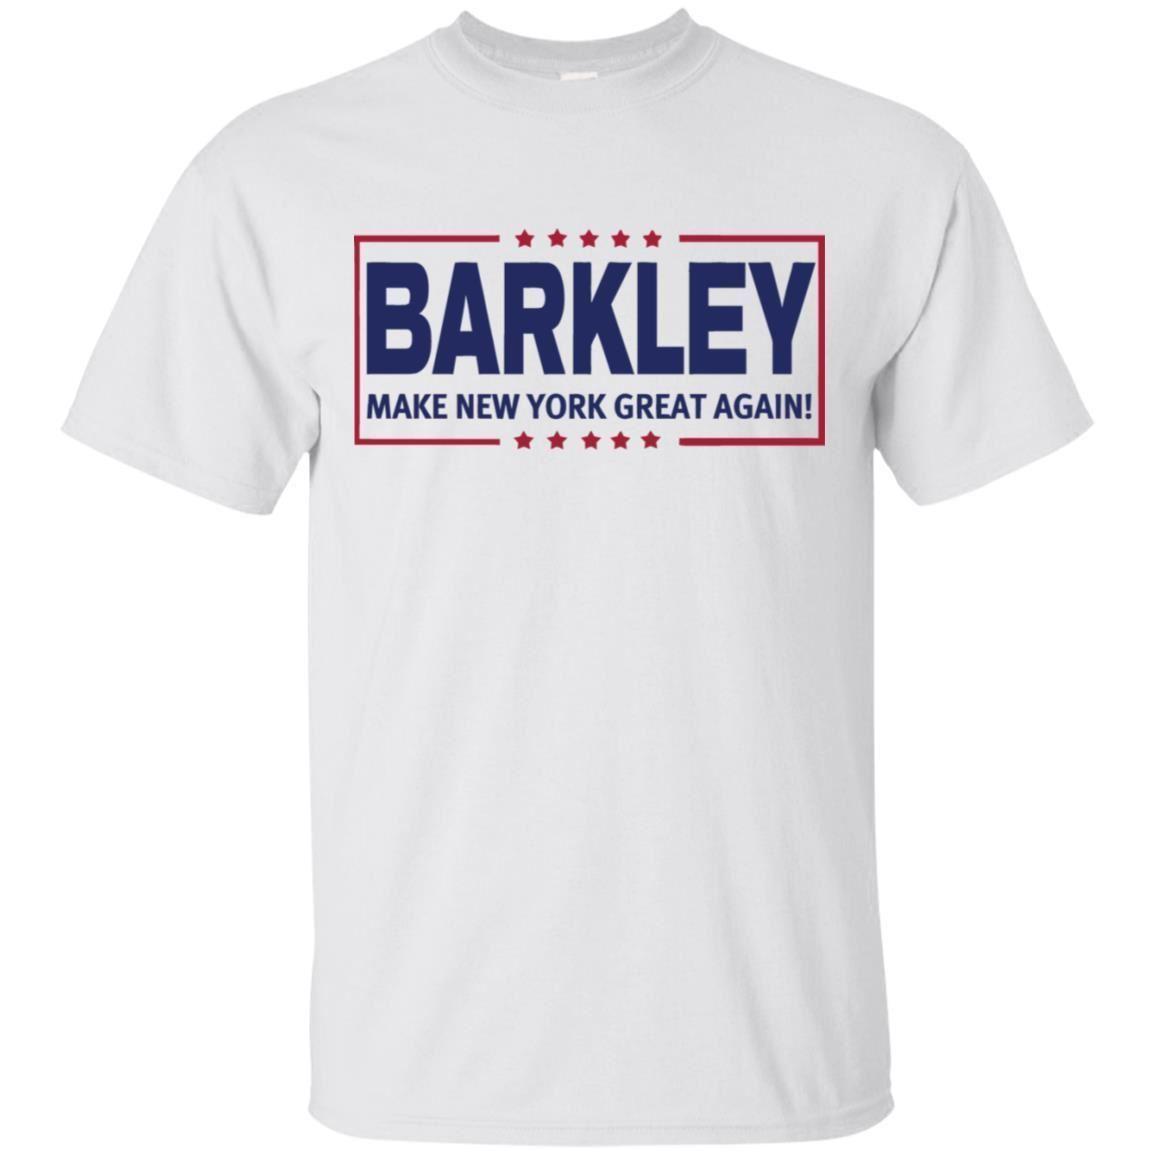 Barkley New Agian Tee York Fashion Make Cotton Men's O-neck Short-sleeve Saquon Funny T-shirt S-5xl Casual Great